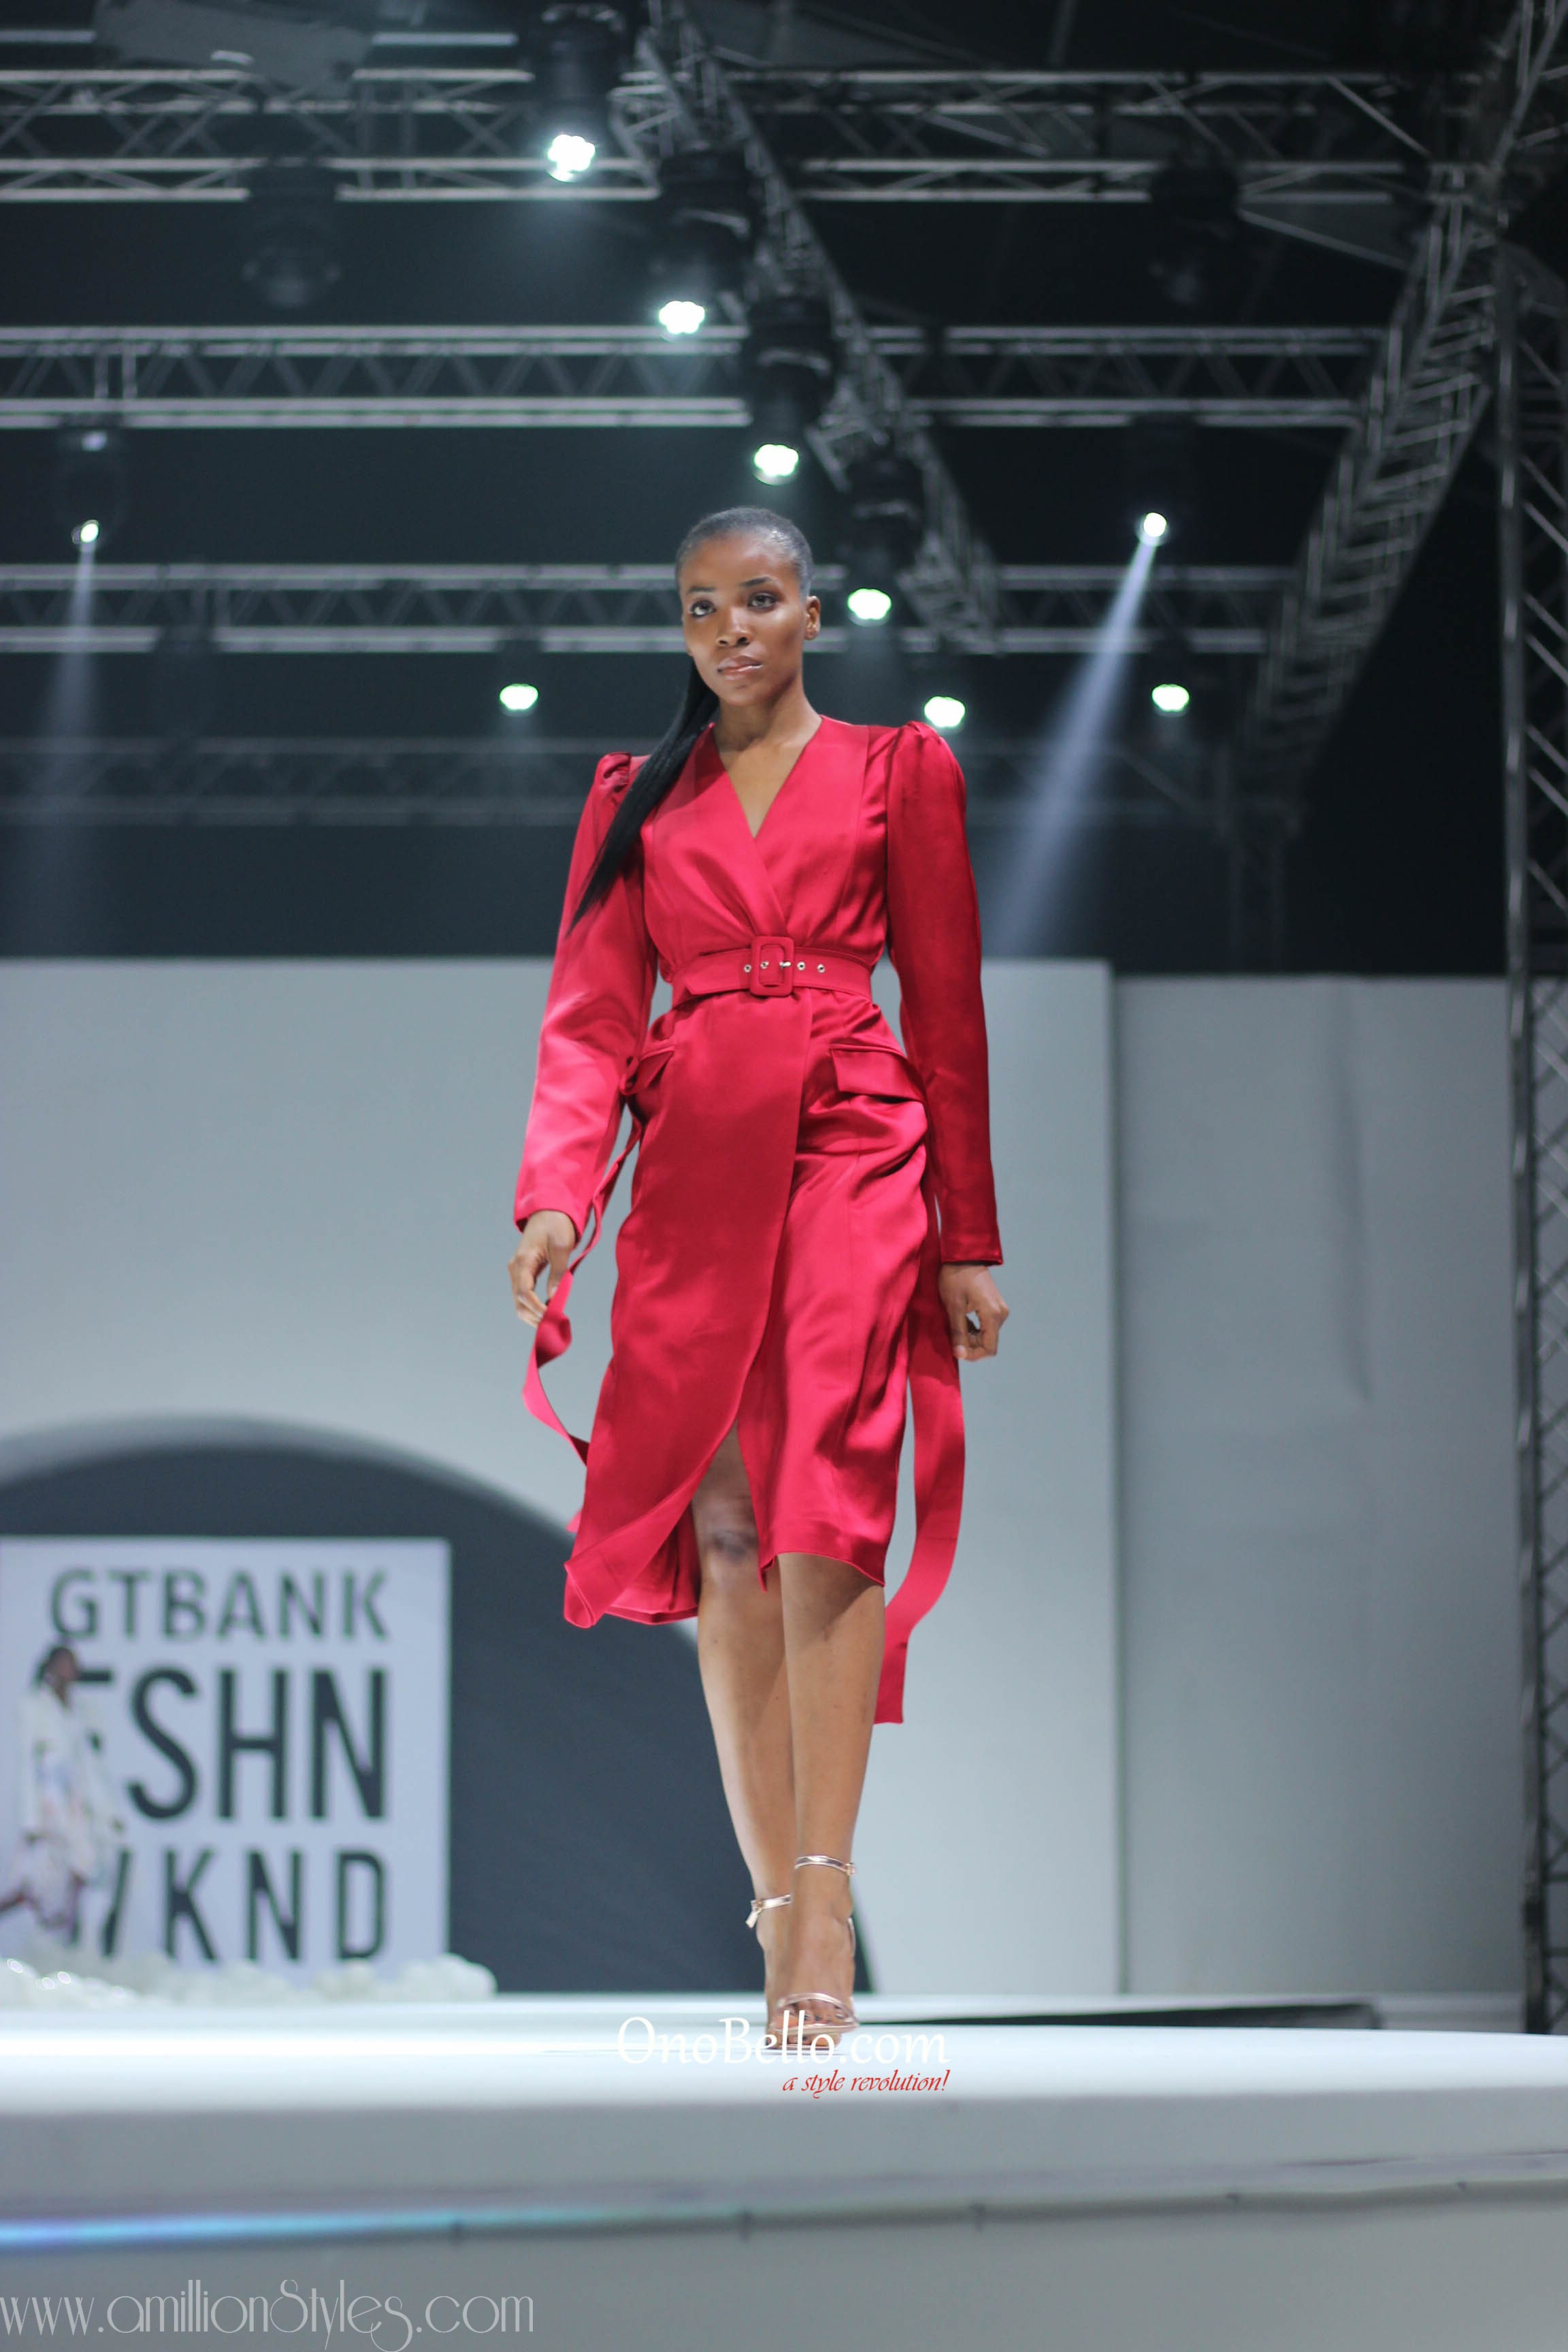 GTBank Fashion Weekend Day 1 Runway Fashion-Style Temple